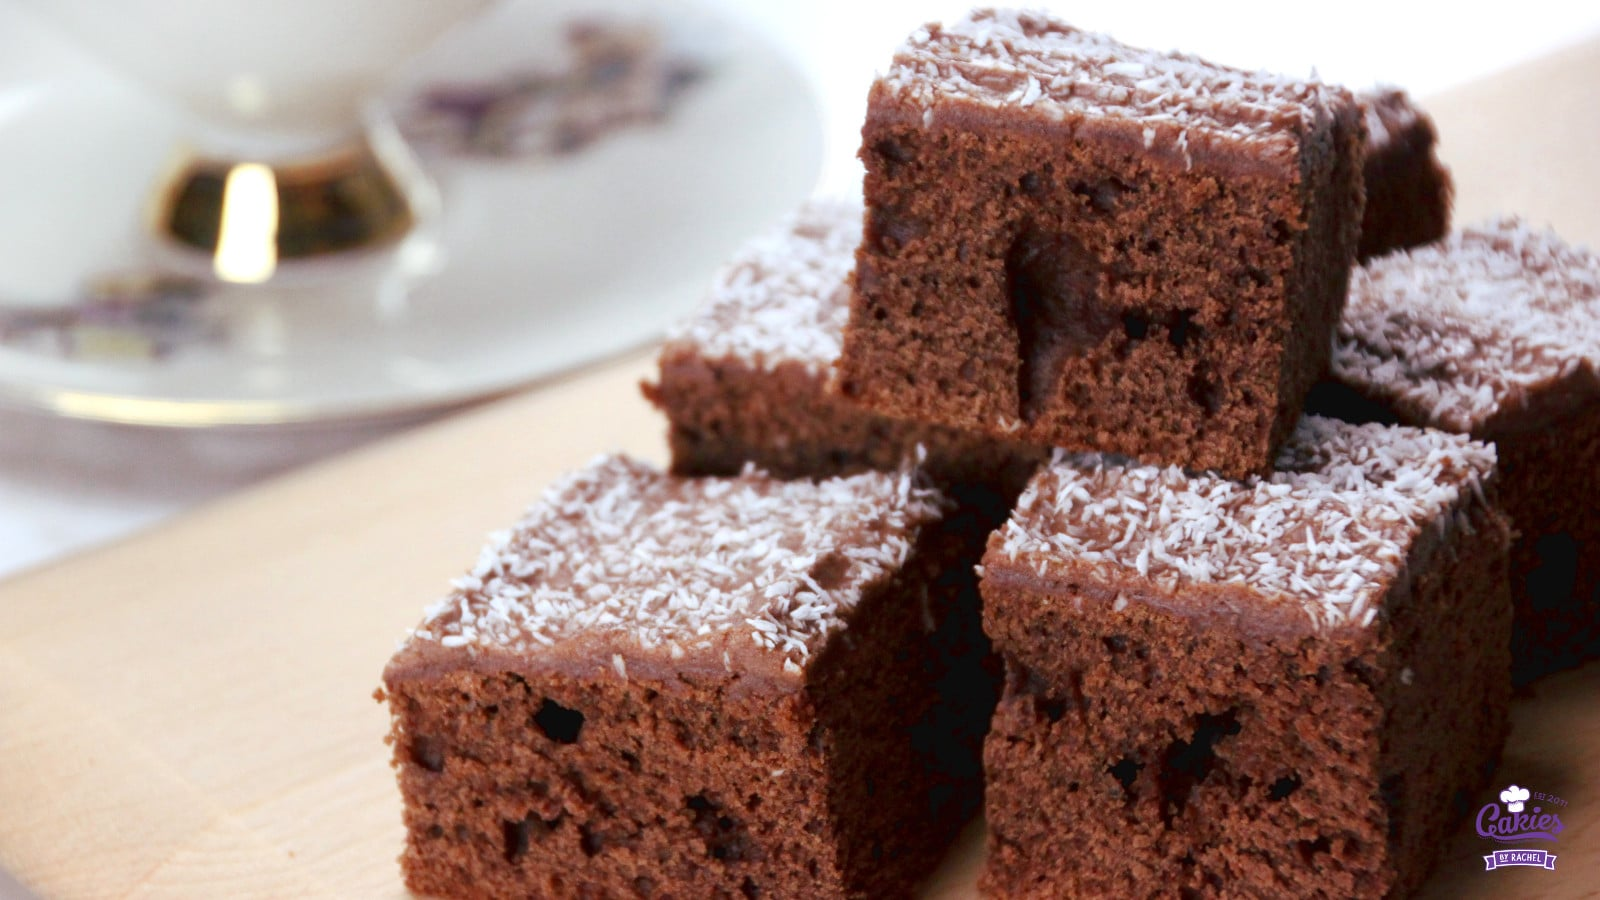 Skffukaka a delicious icelandic brownie recipe cakies skffukaka 26 forumfinder Choice Image